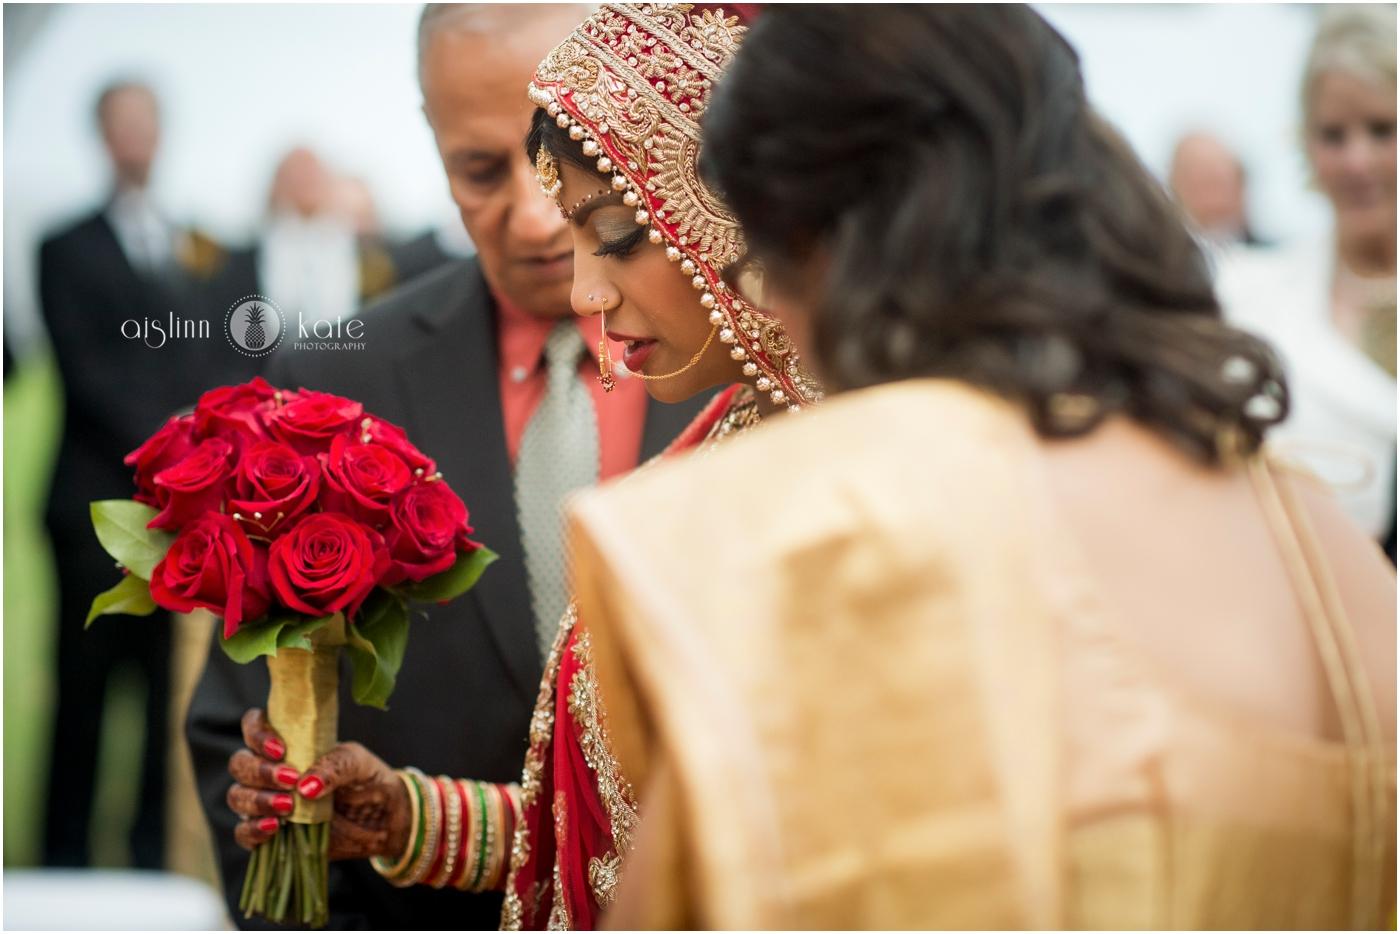 Pensacola-Destin-Wedding-Photographer_5144.jpg